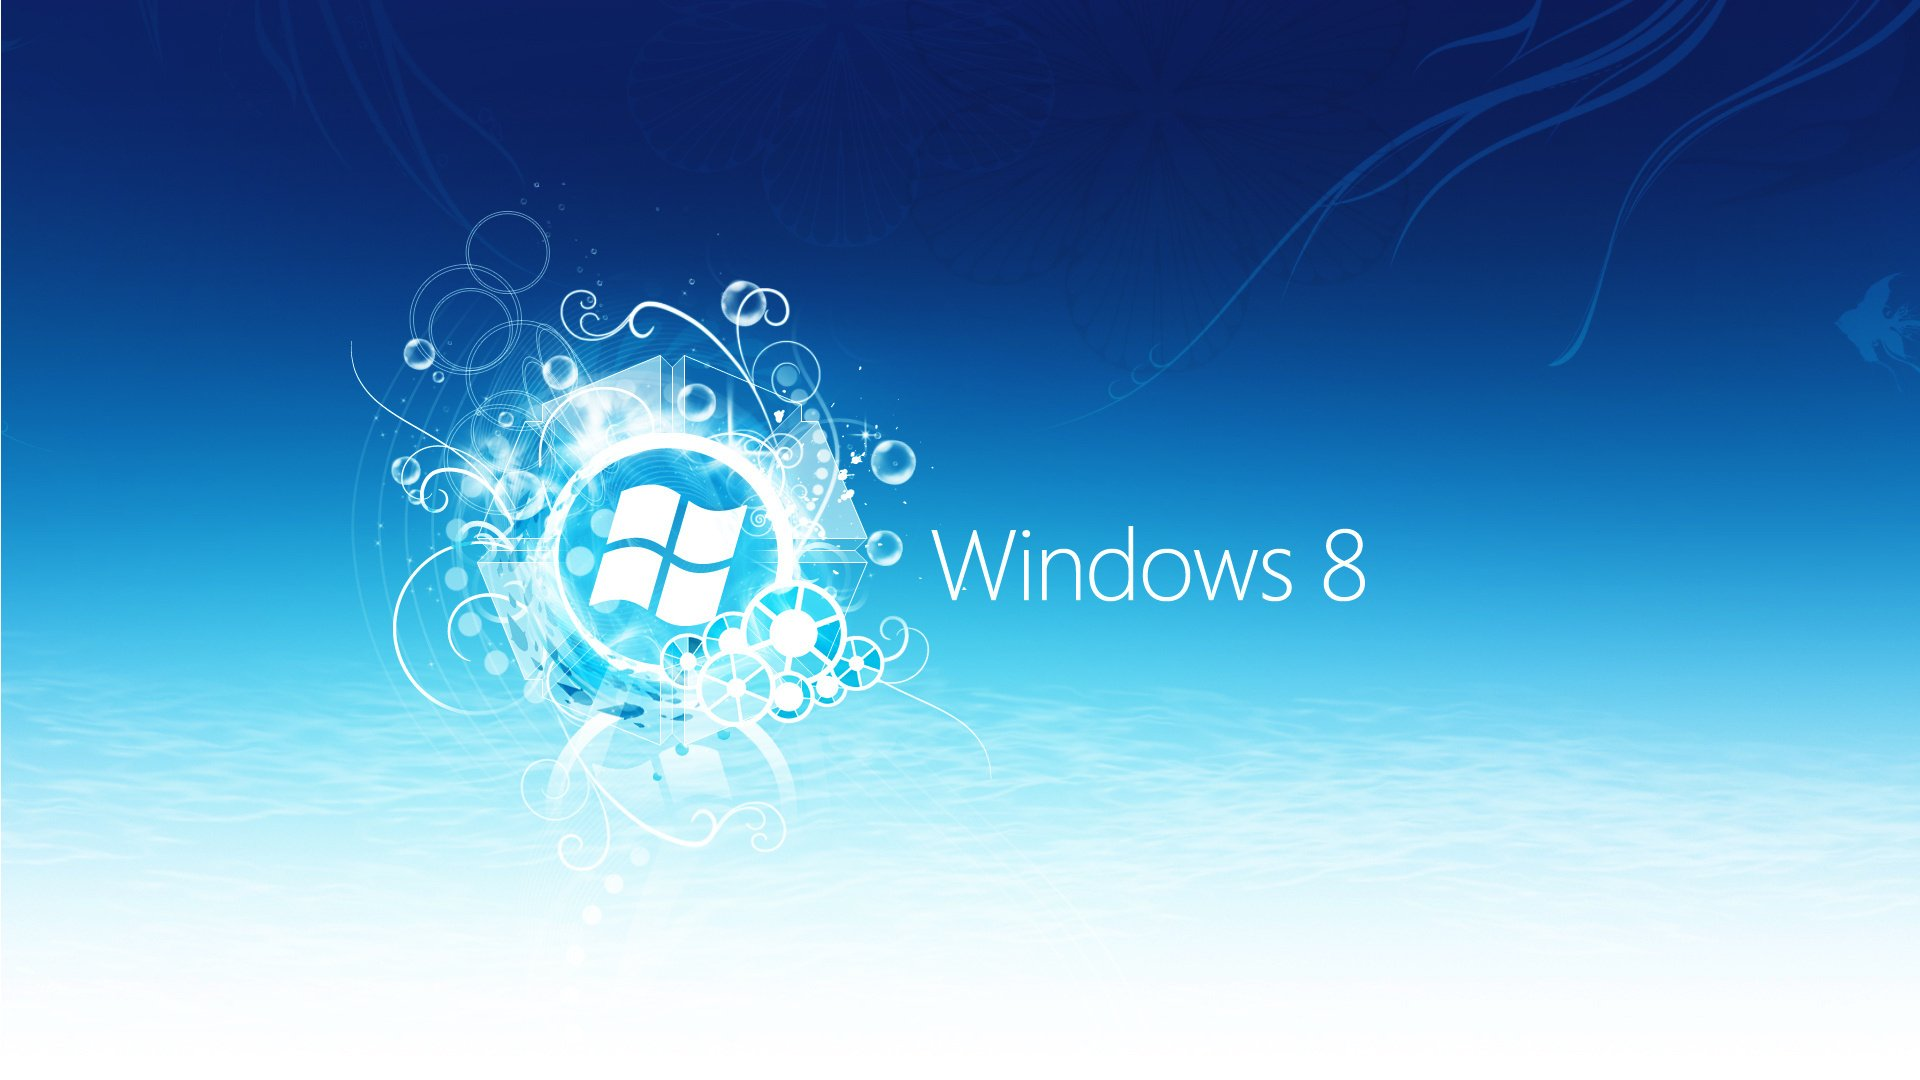 Sexy Live Wallpapers For Windows 8 Wallpapersafari